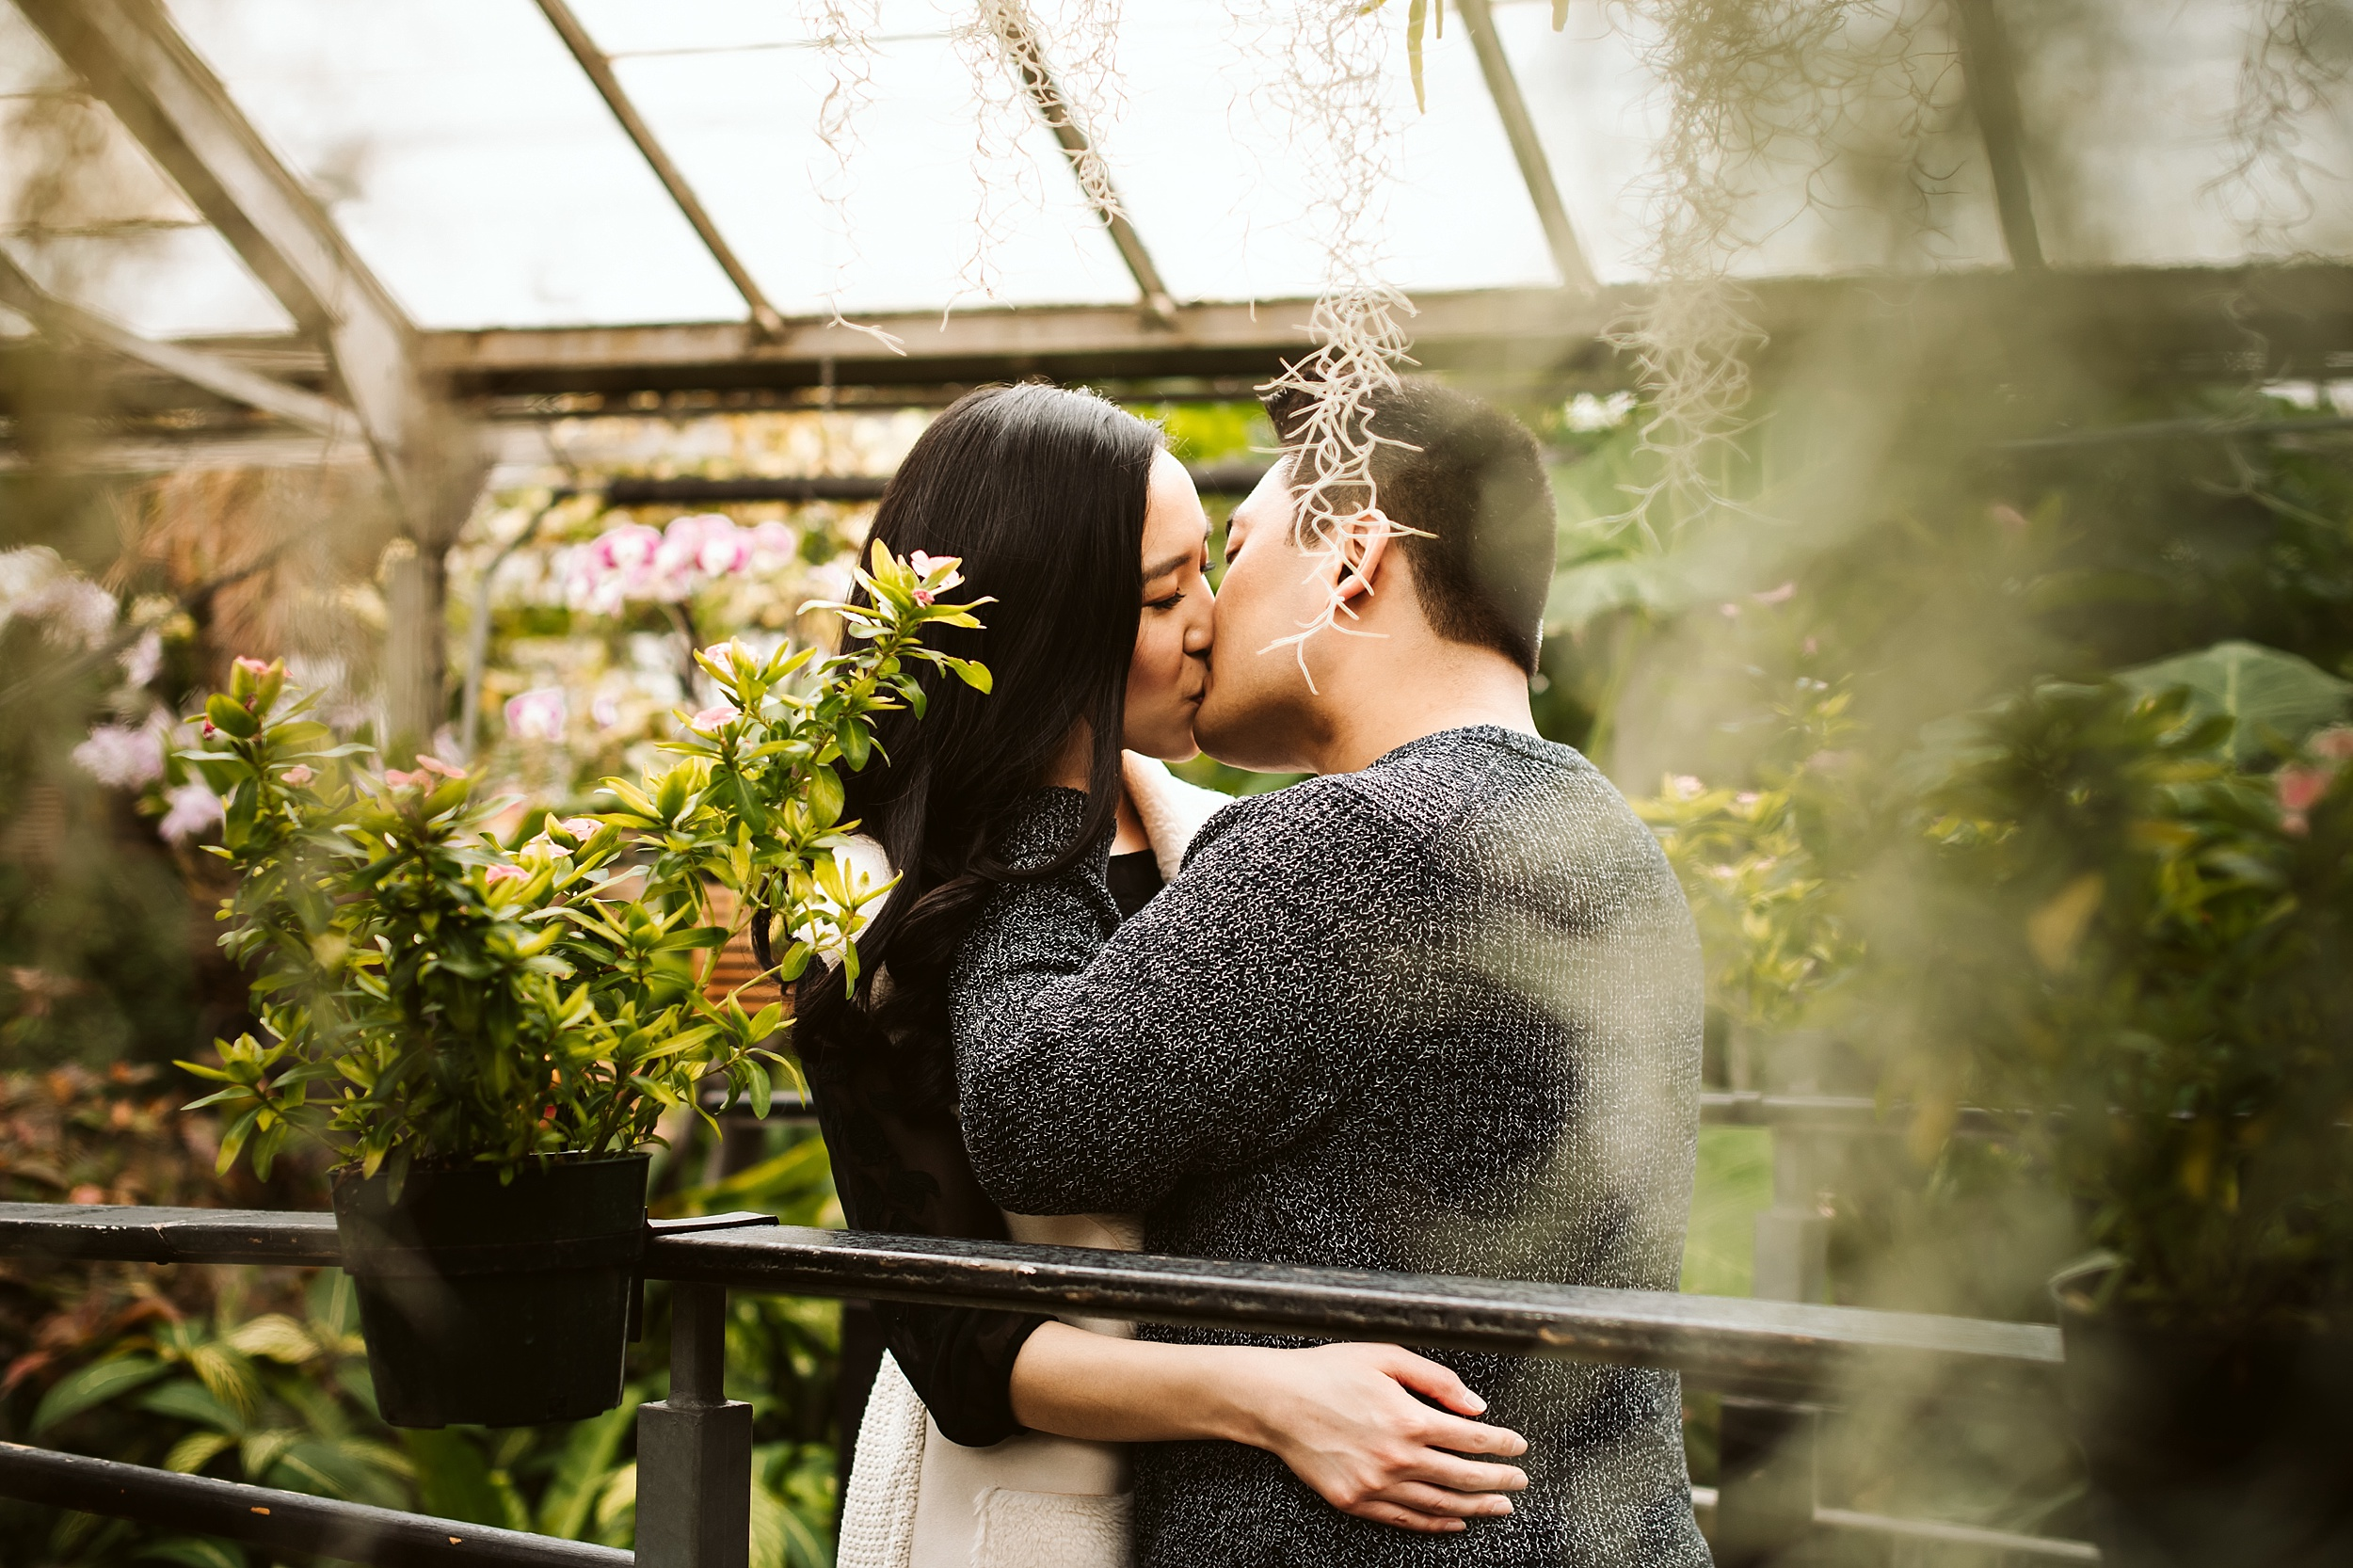 Allan_Gardens_Engagement_Shoot_Toronto_Wedding_Photographer_0004.jpg